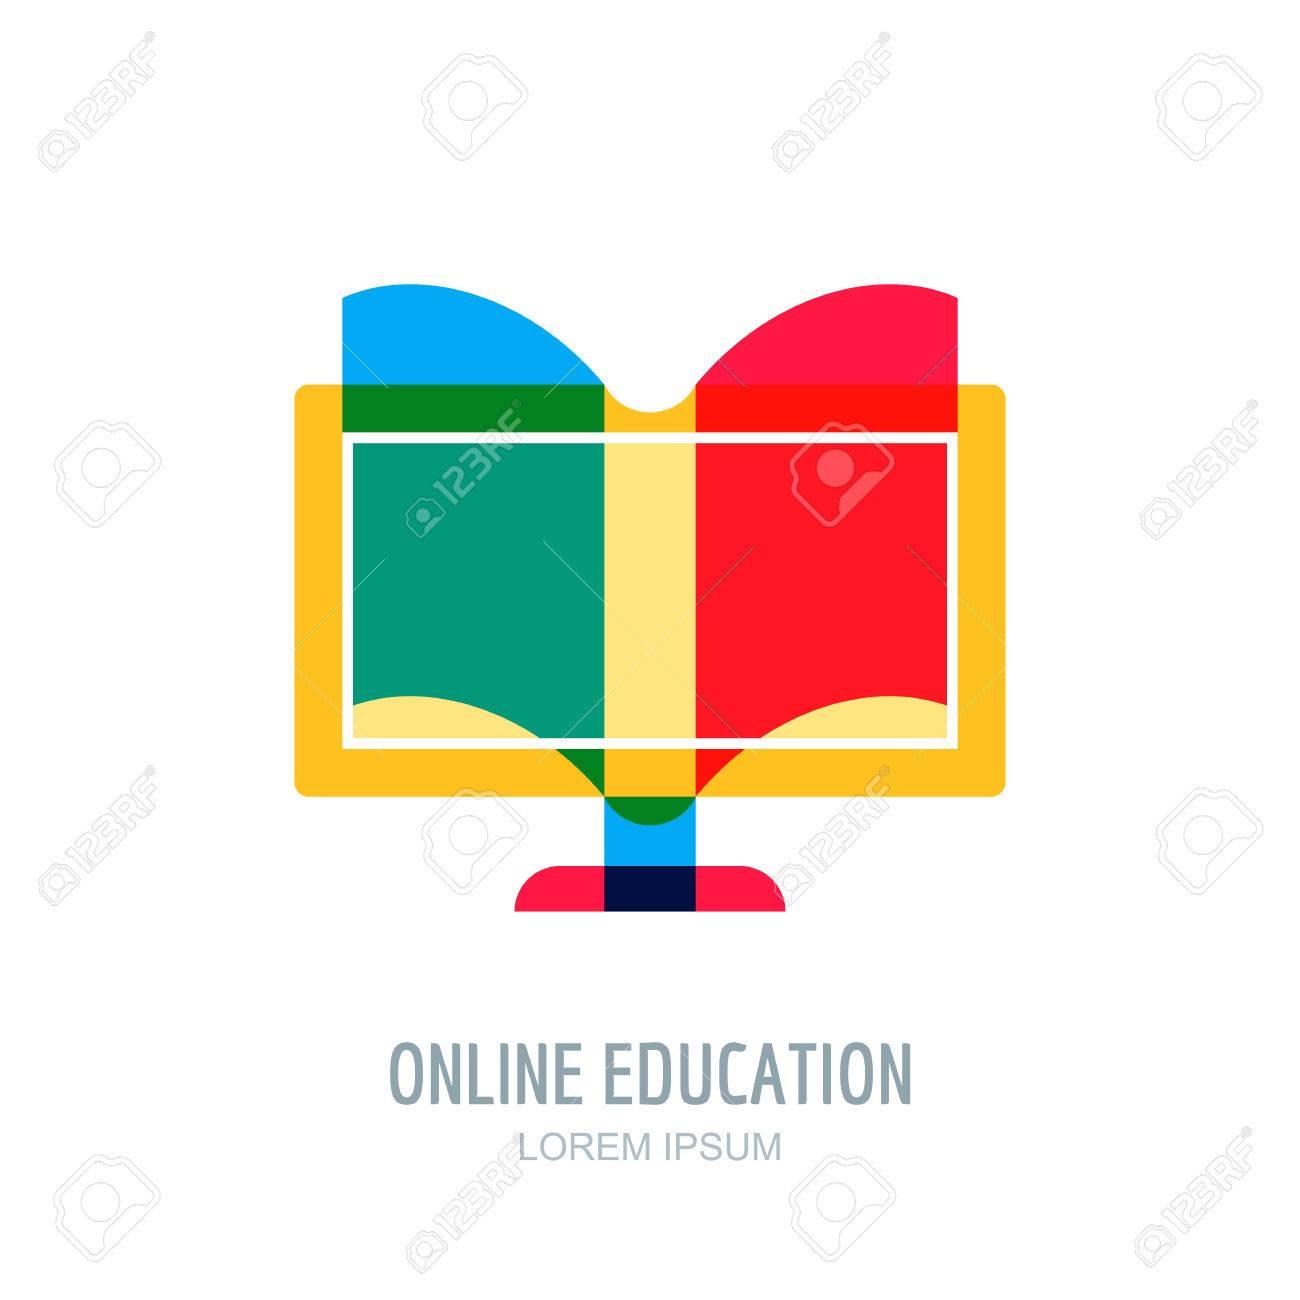 online distance education vector logo icon design template